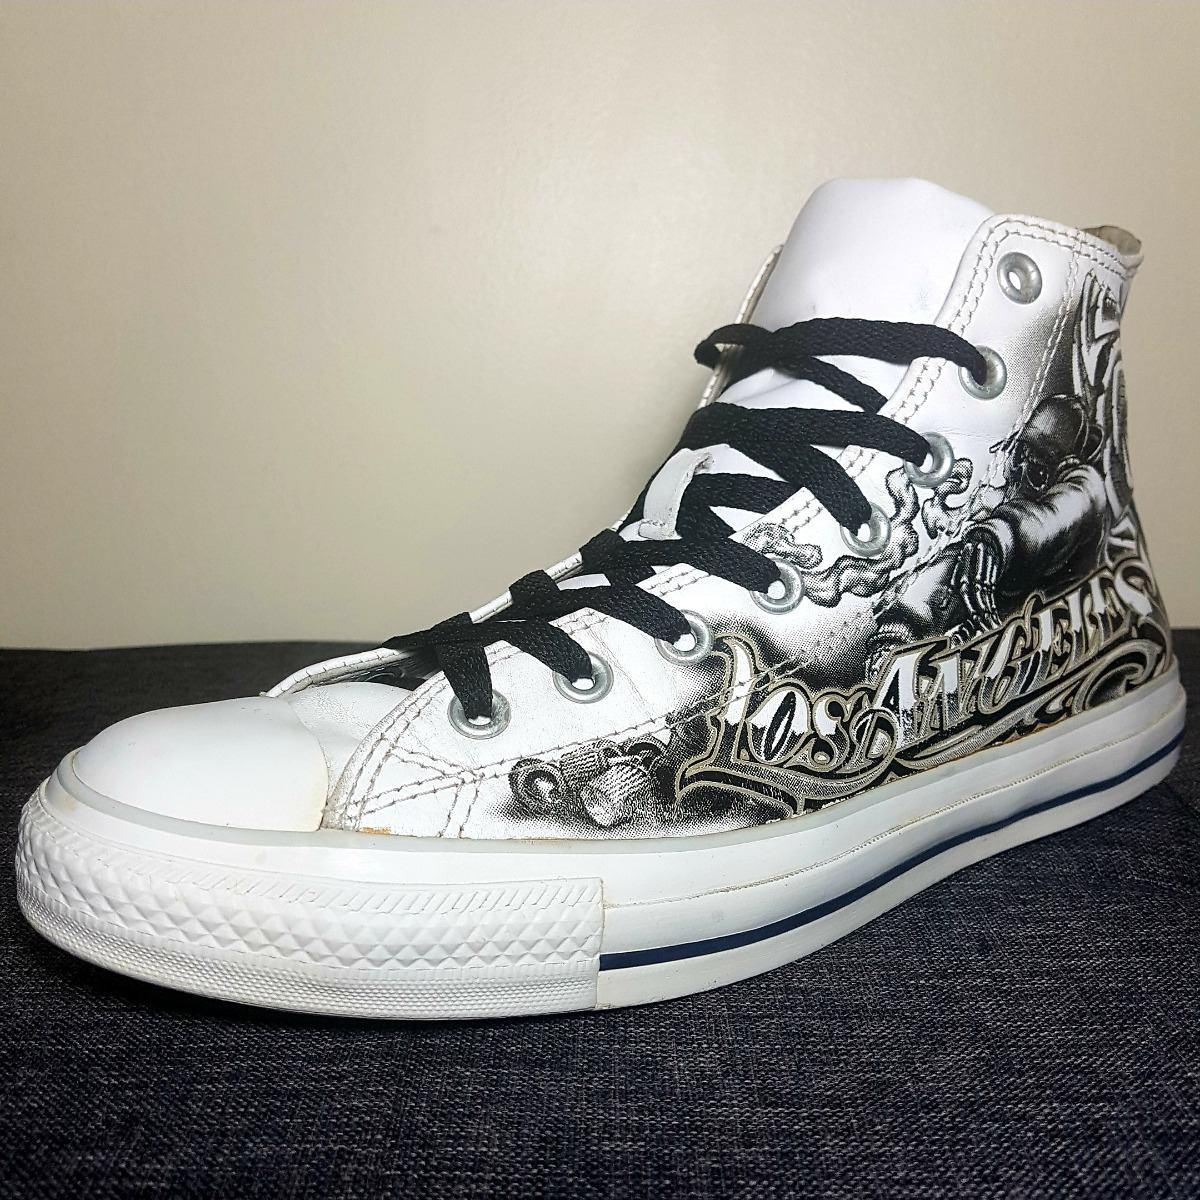 011f0783d5f0 zapatilla botín para hombre converse diseño grafiti. Cargando zoom.